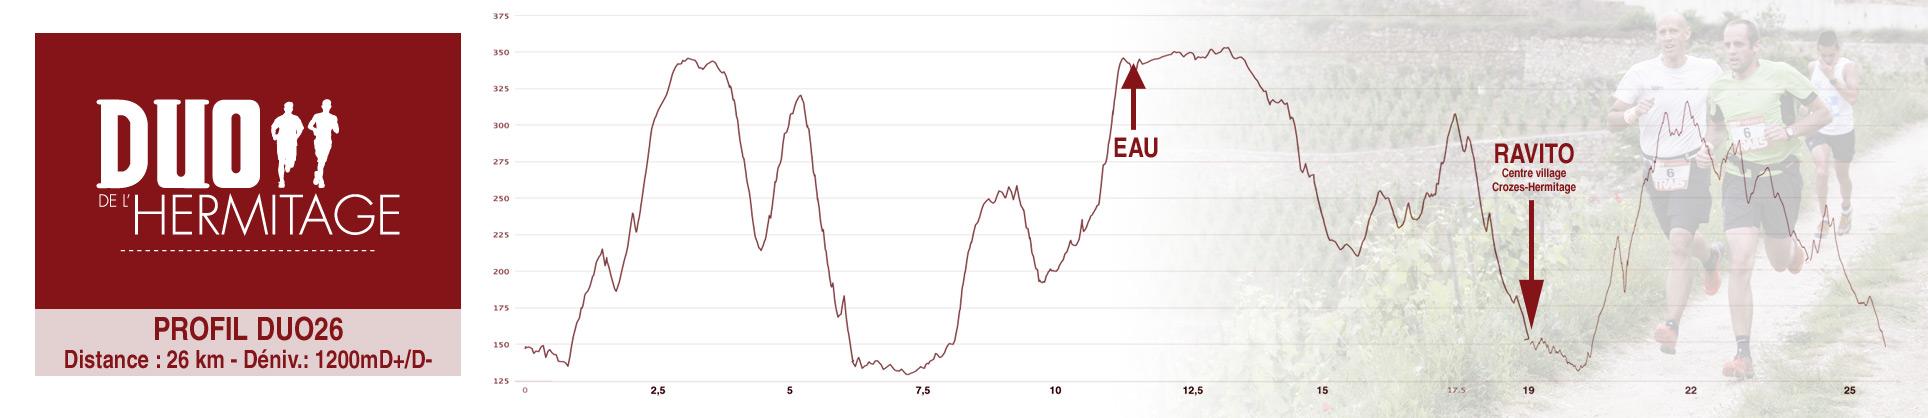 Profil DUO HERMITAGE 2016 - 26 km